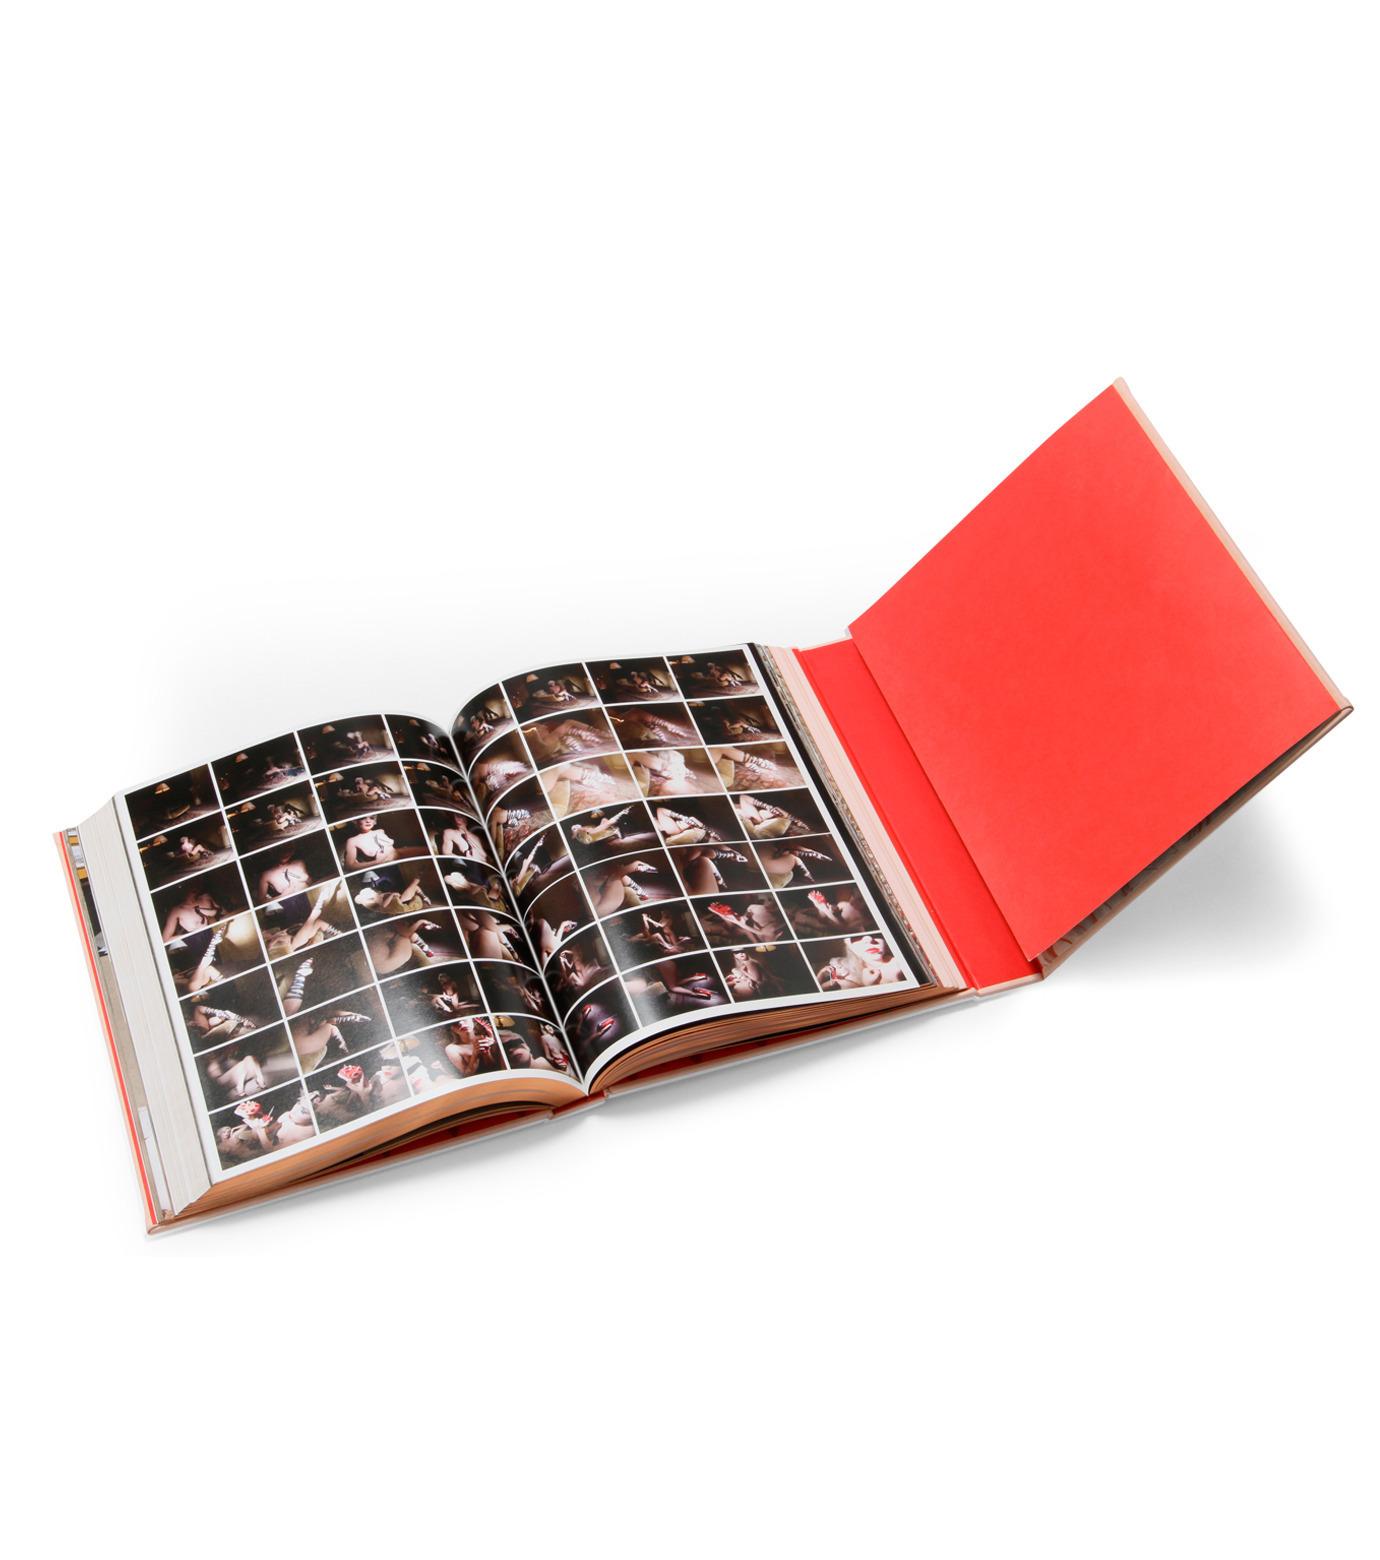 ArtBook(アートブック)のChristian Louboutin-SALMON PINK(インテリア/OTHER-GOODS/interior/OTHER-GOODS)-8478-3651-7-73 拡大詳細画像4